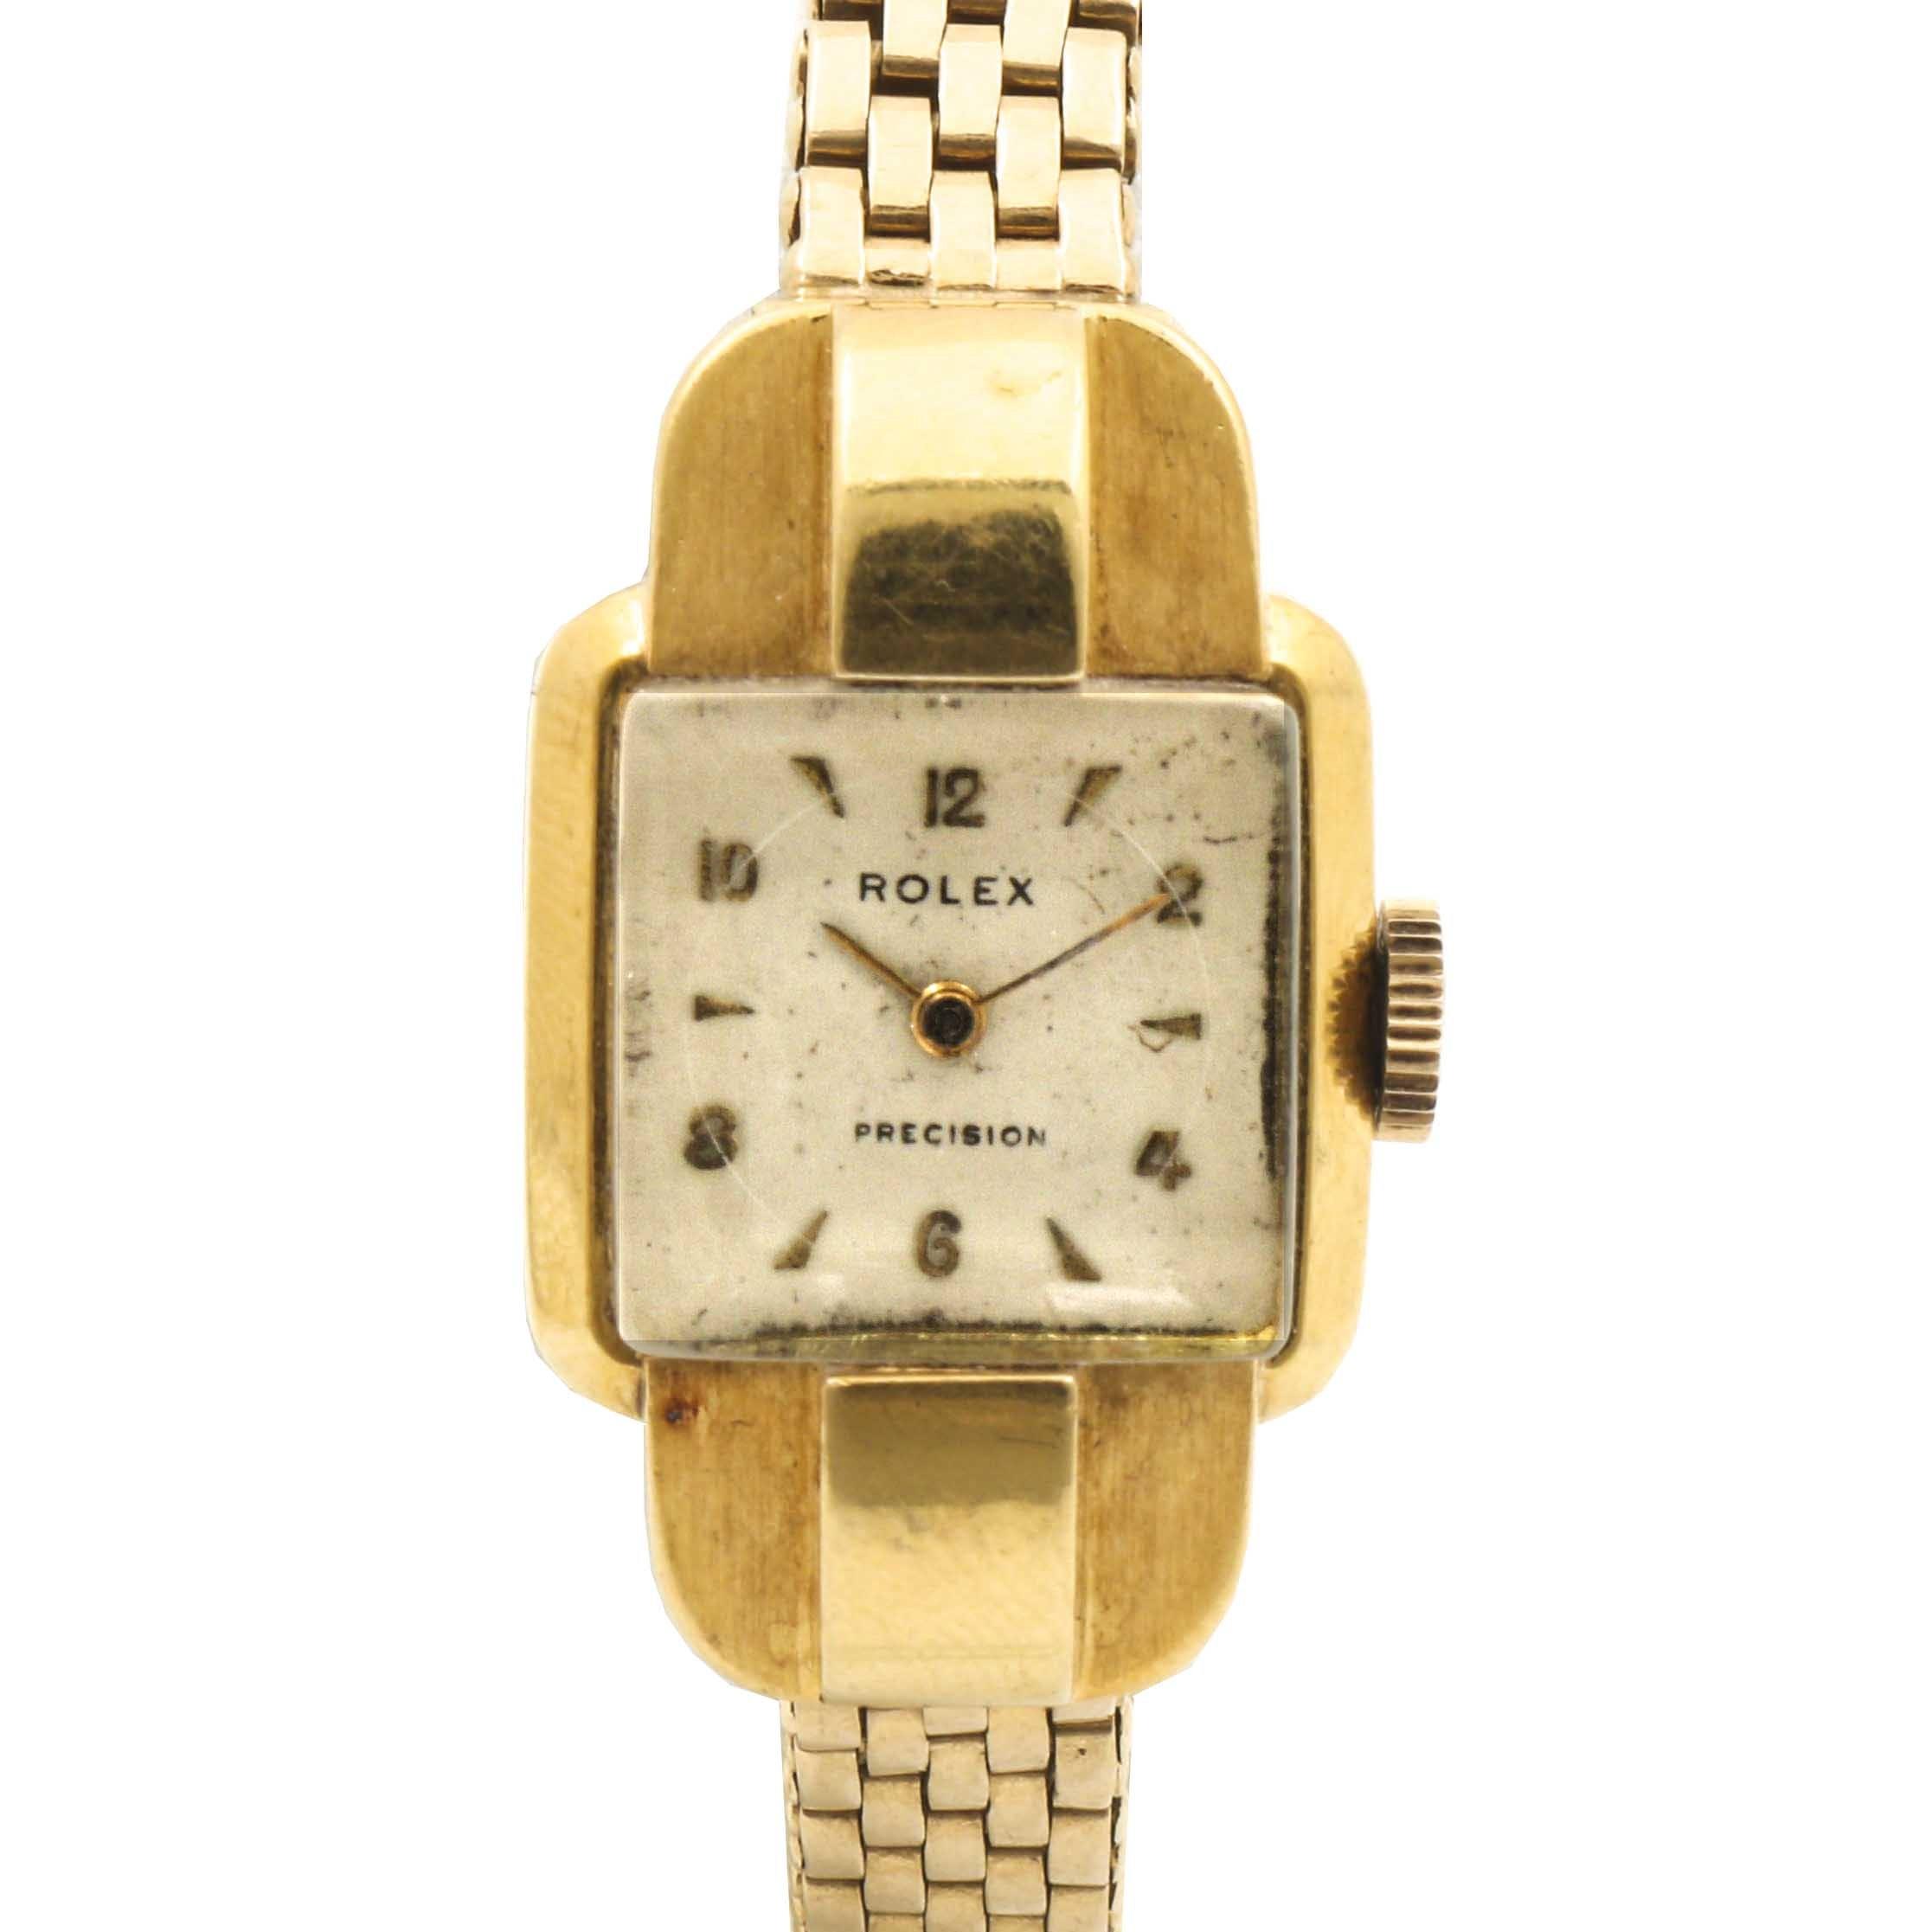 Rolex 18K and 14K Yellow Gold Wristwatch